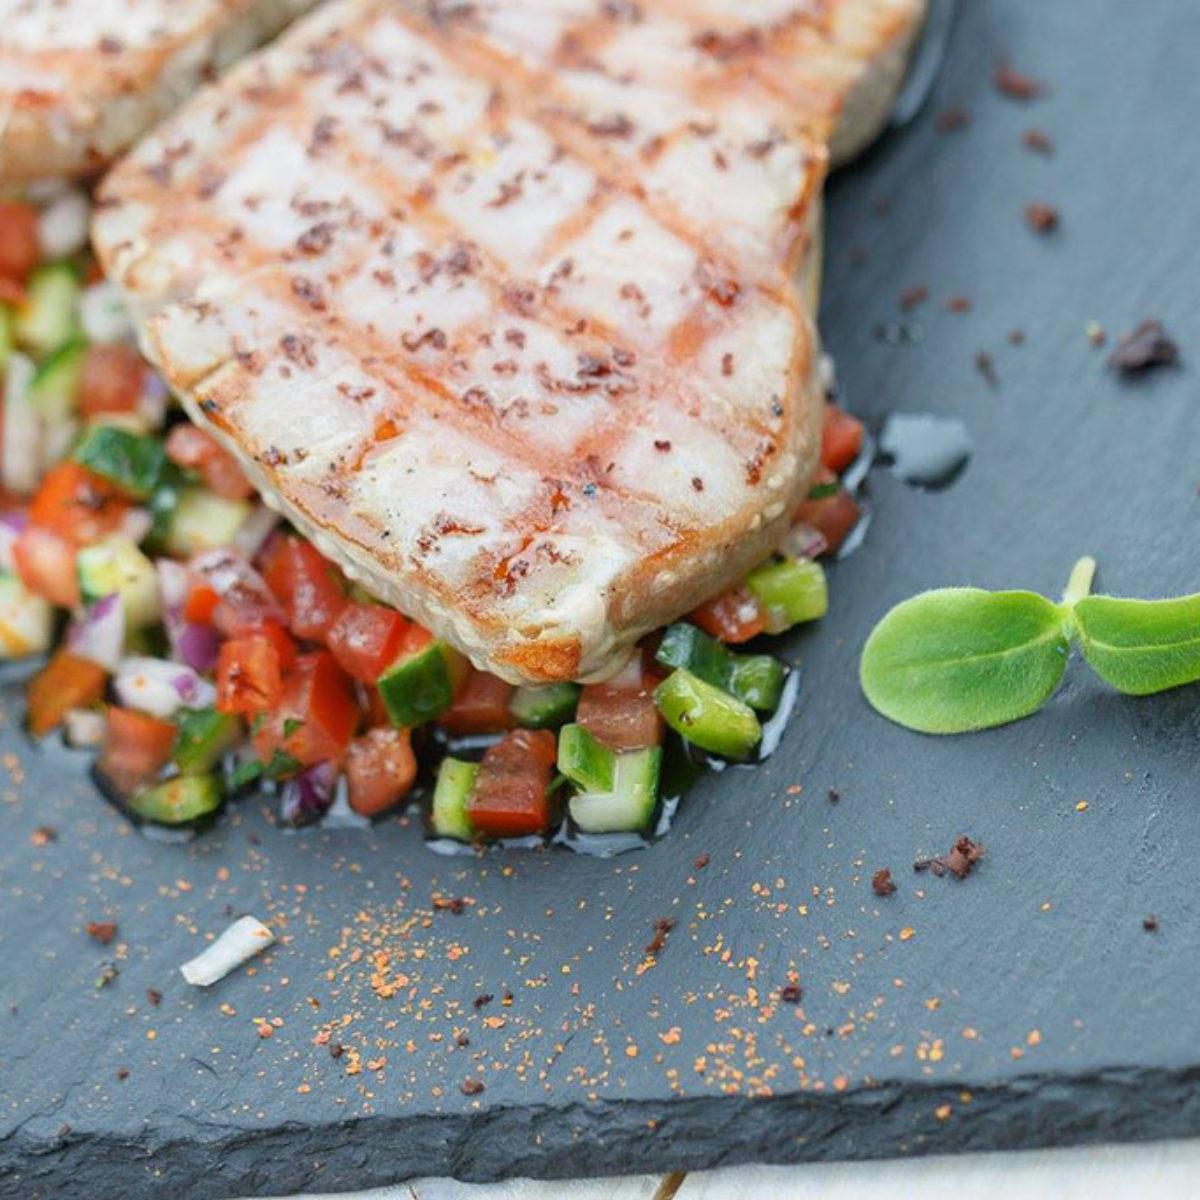 Yiamas Gastro Bar - Καλαμάτα - Μοντέρνα Ευρωπαϊκή Κουζίνα - Gastronomy 17